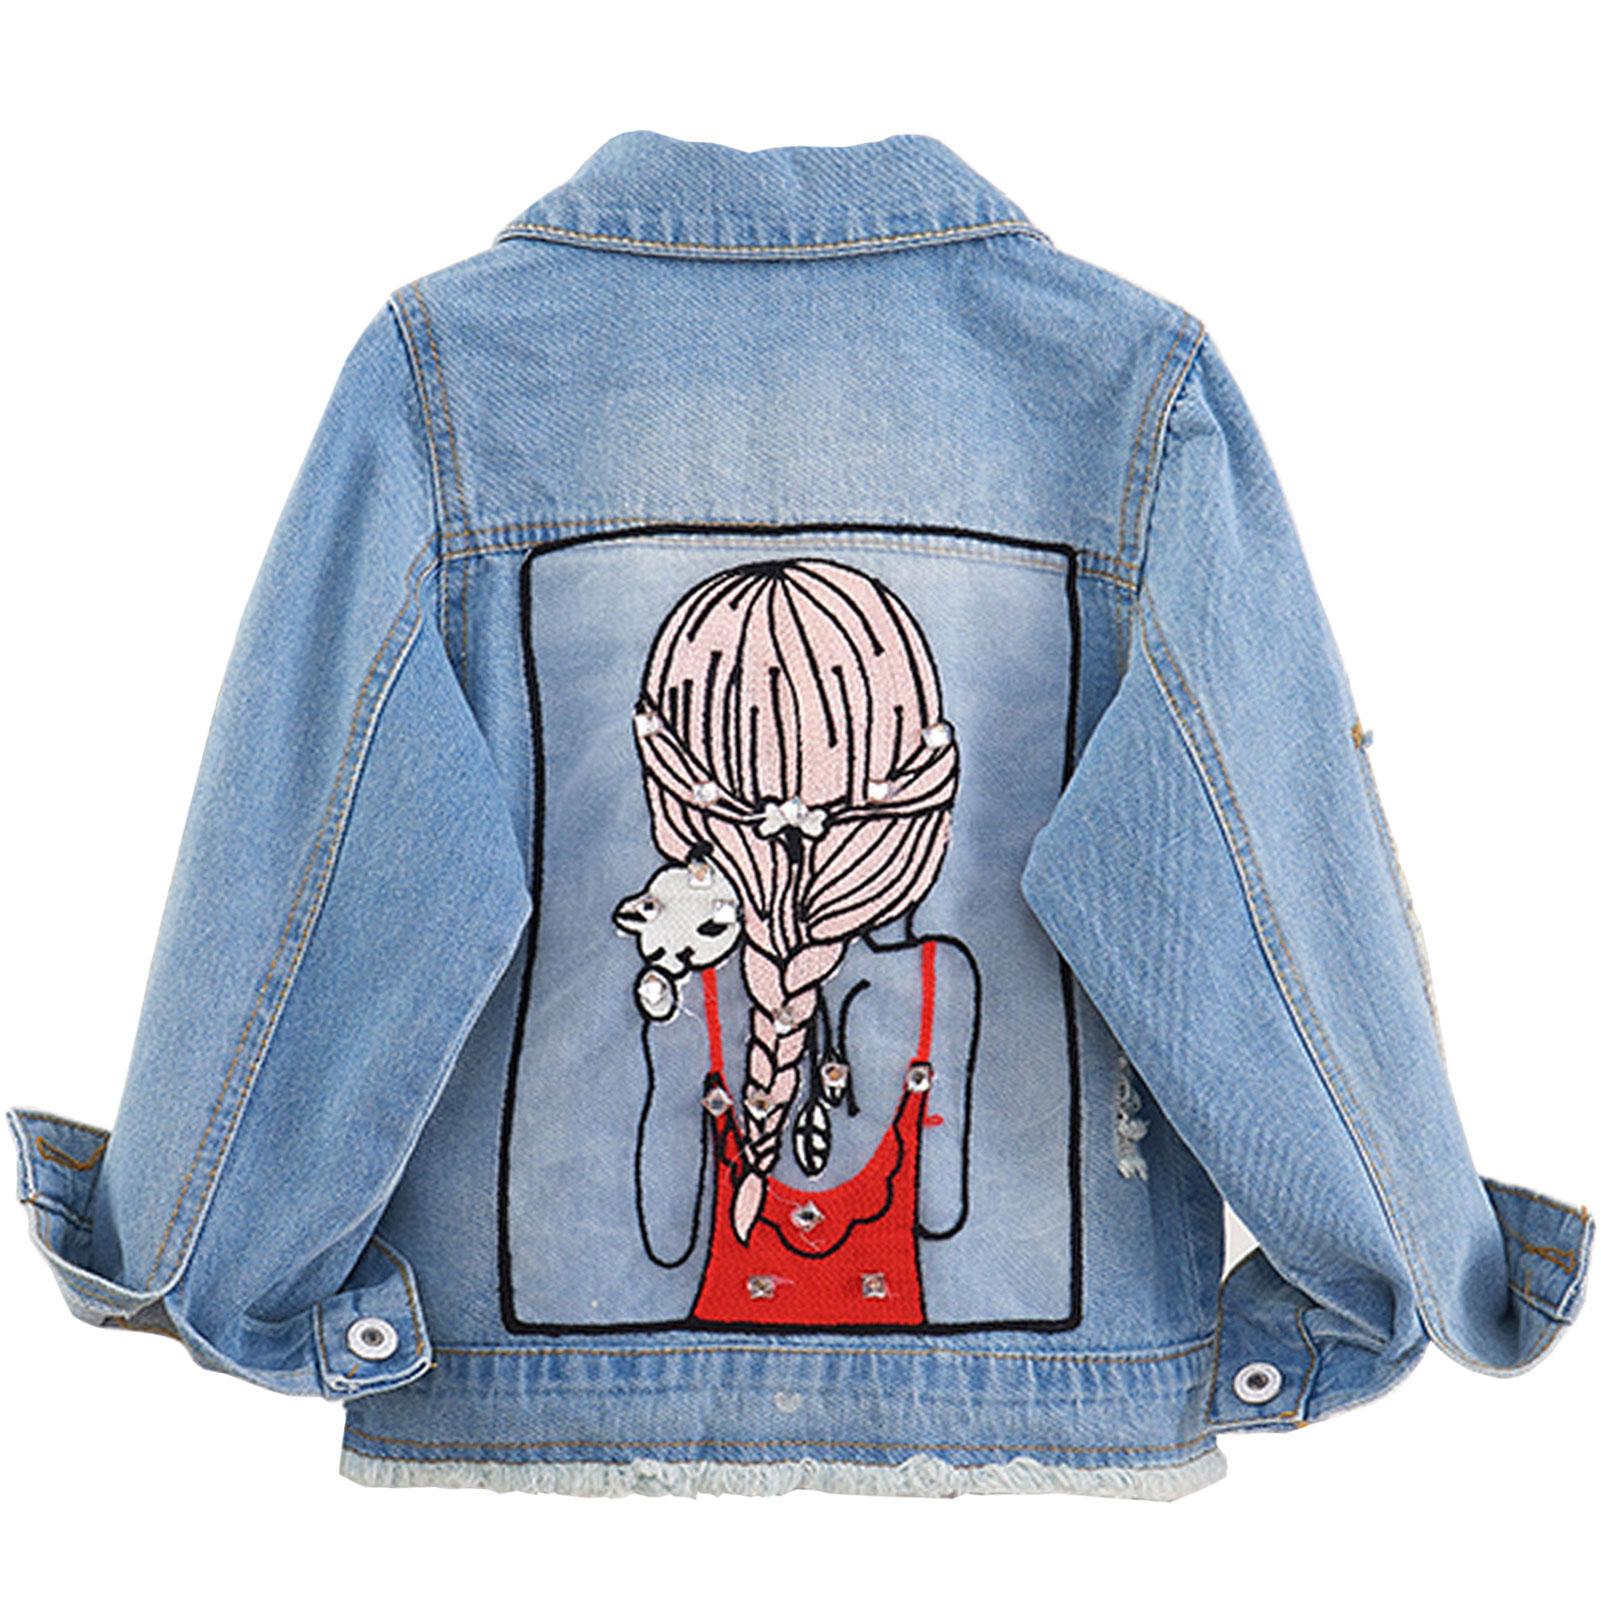 Girls Denim Jacket Unique Sequin Cute Girls Back Decal Lapel Multi-Pocket Cowboy Coat 2-12T Tassels Overwear for Autumn Clothes